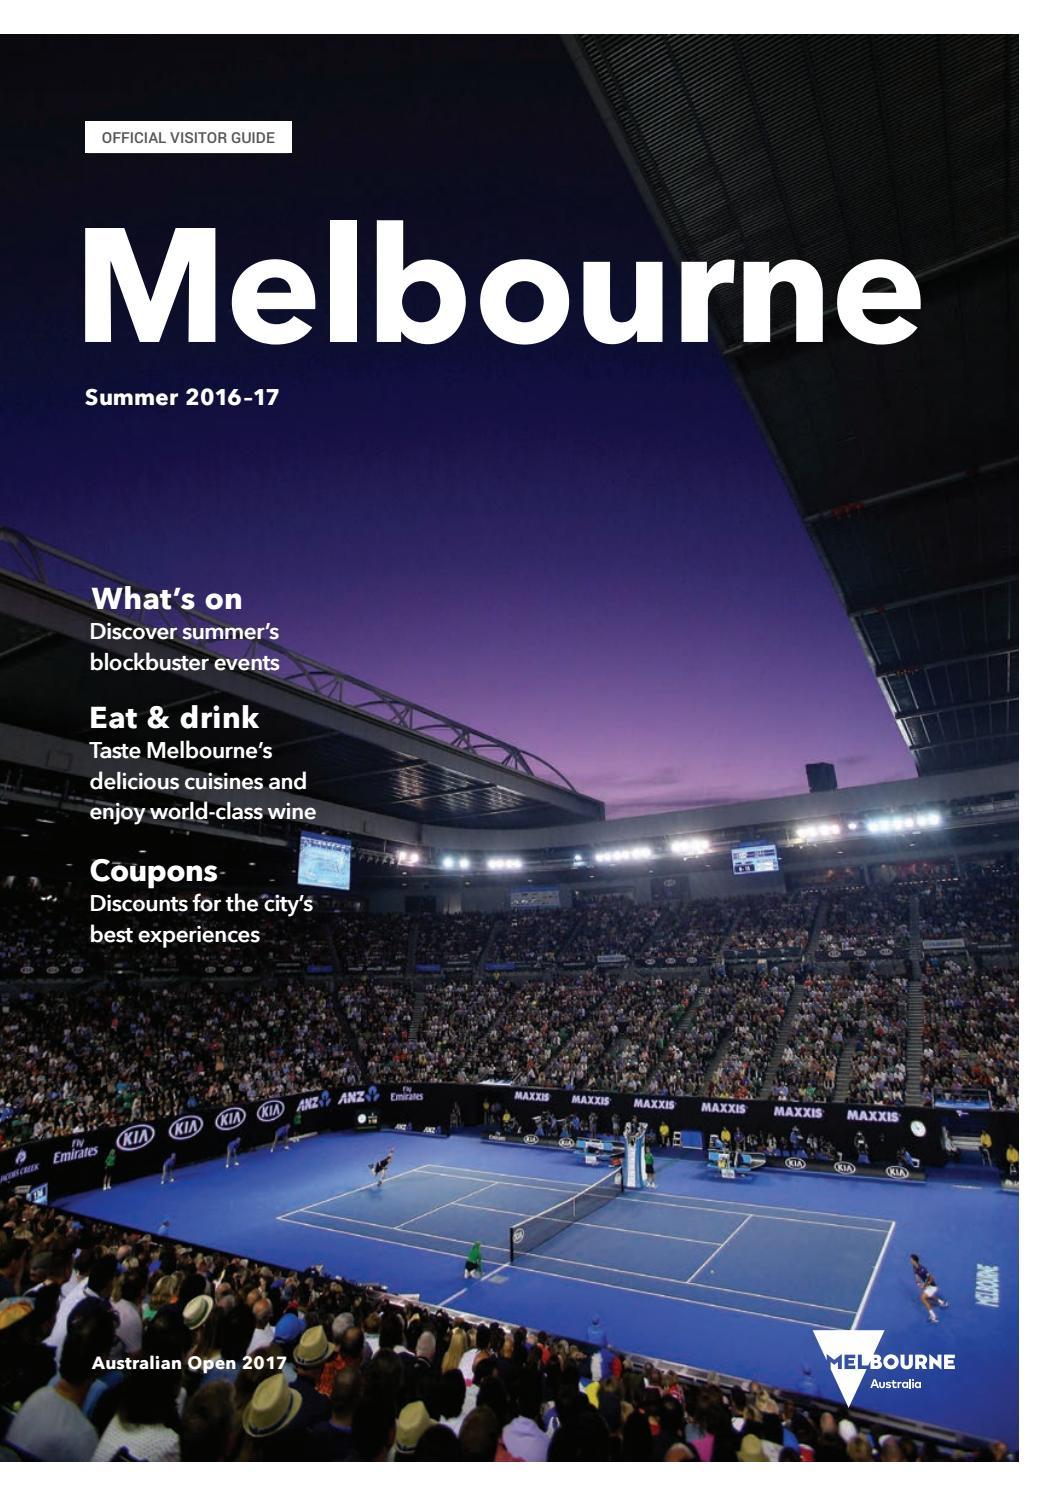 Melbourne Official Visitors Guide - Summer 2017 by Destination Melbourne -  issuu